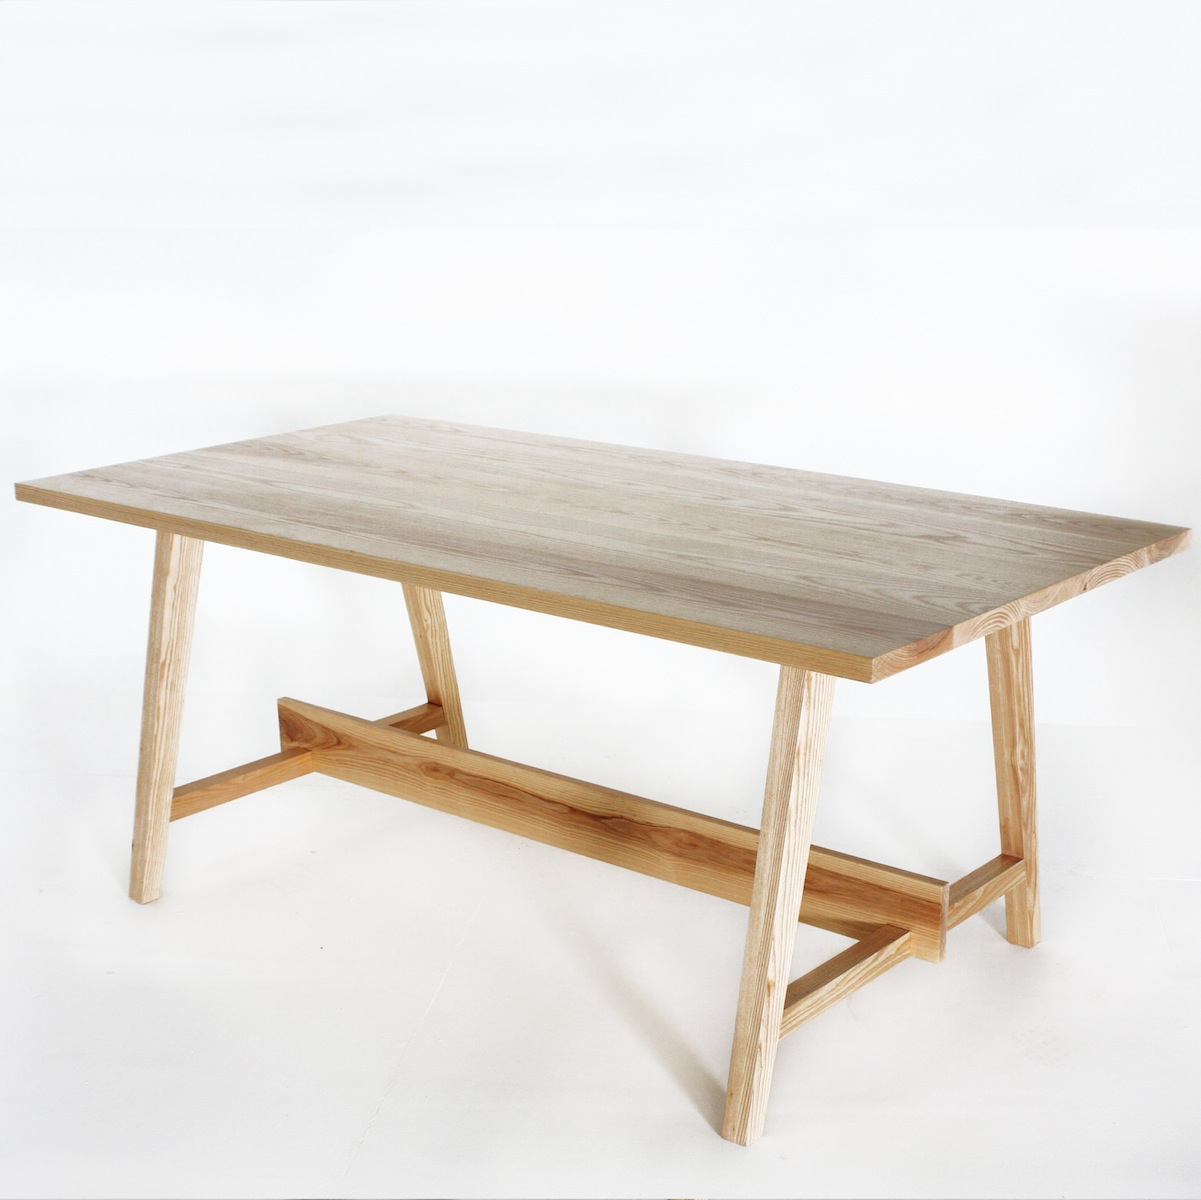 Ash Wood Furniture ~ The goodwood co urban table in american ash wood